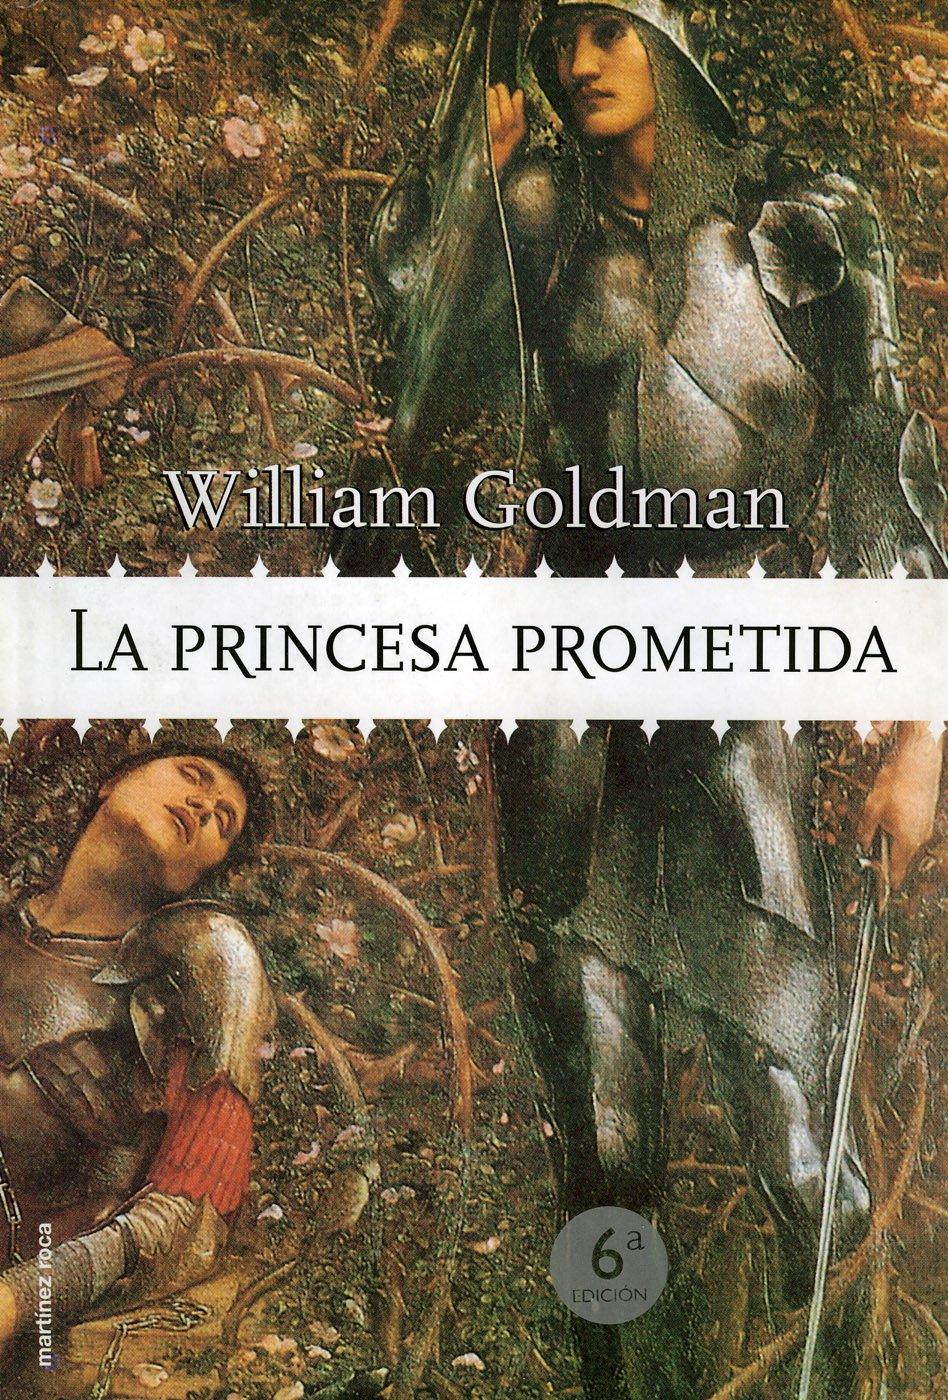 La princesa prometida (MR Dimensiones) Tapa dura – 1 ene 1901 William Goldman Ediciones Martínez Roca 8427030630 986575